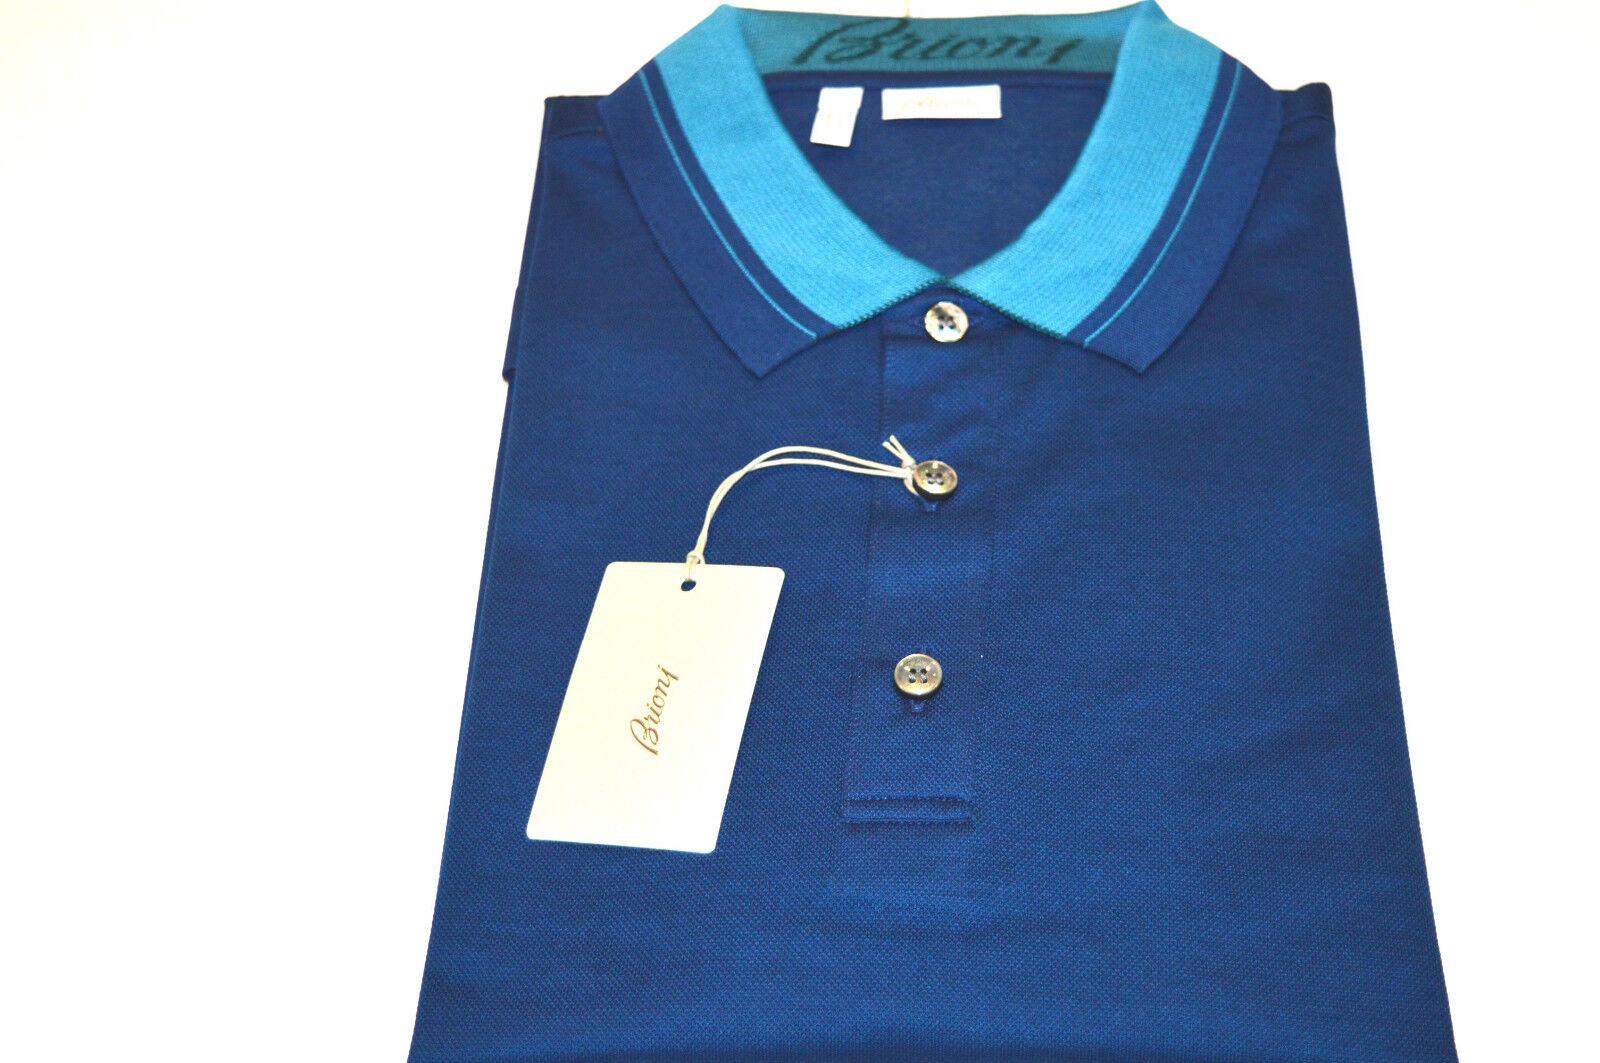 b8f104106e6 NEW BRIONI Polo Short Sleeve Cotton Size L Us Eu 52 (Cod Tubic6 ...